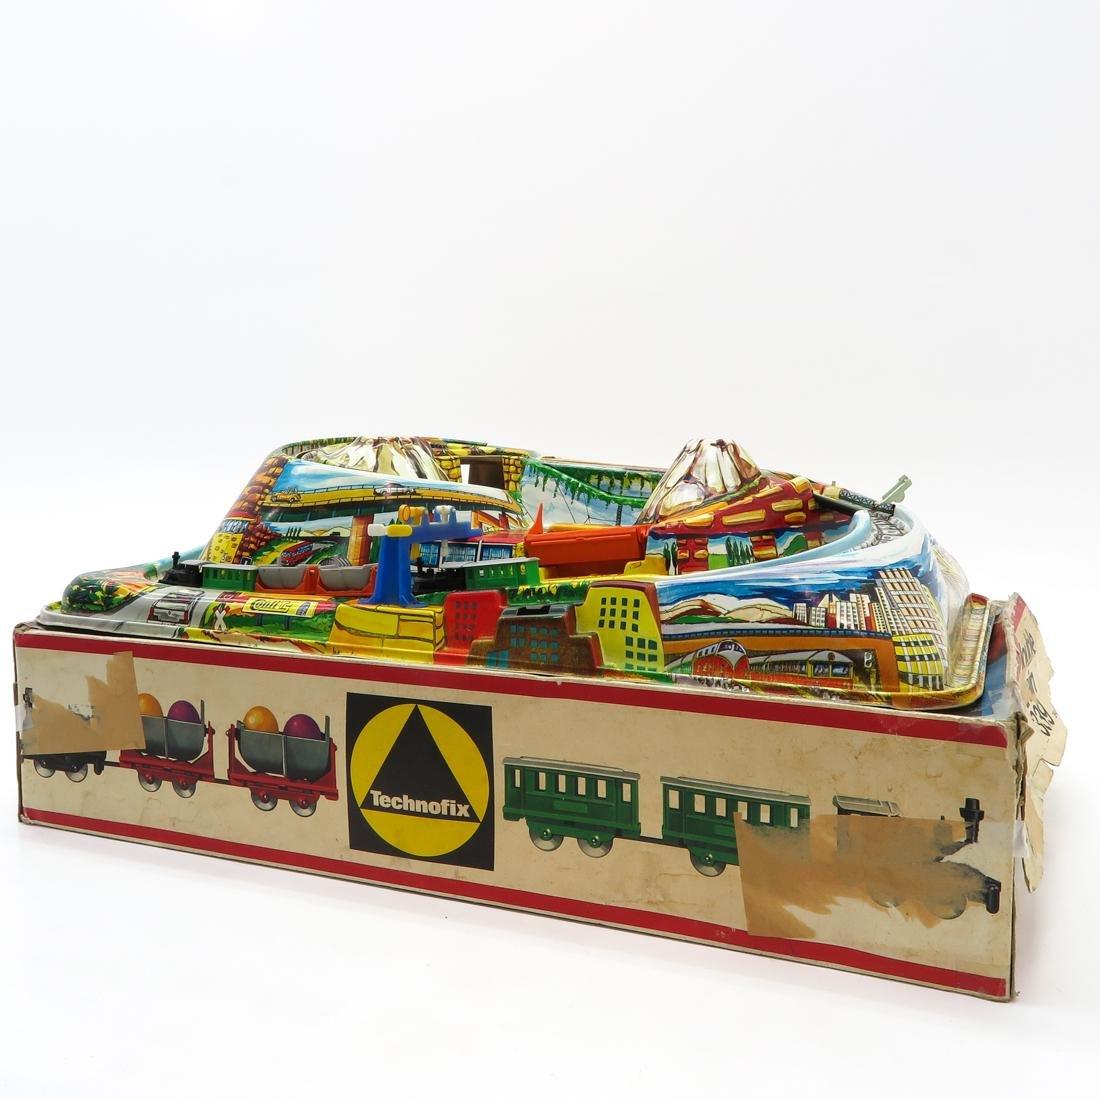 Vintage Technofix Train in Original Box - 3